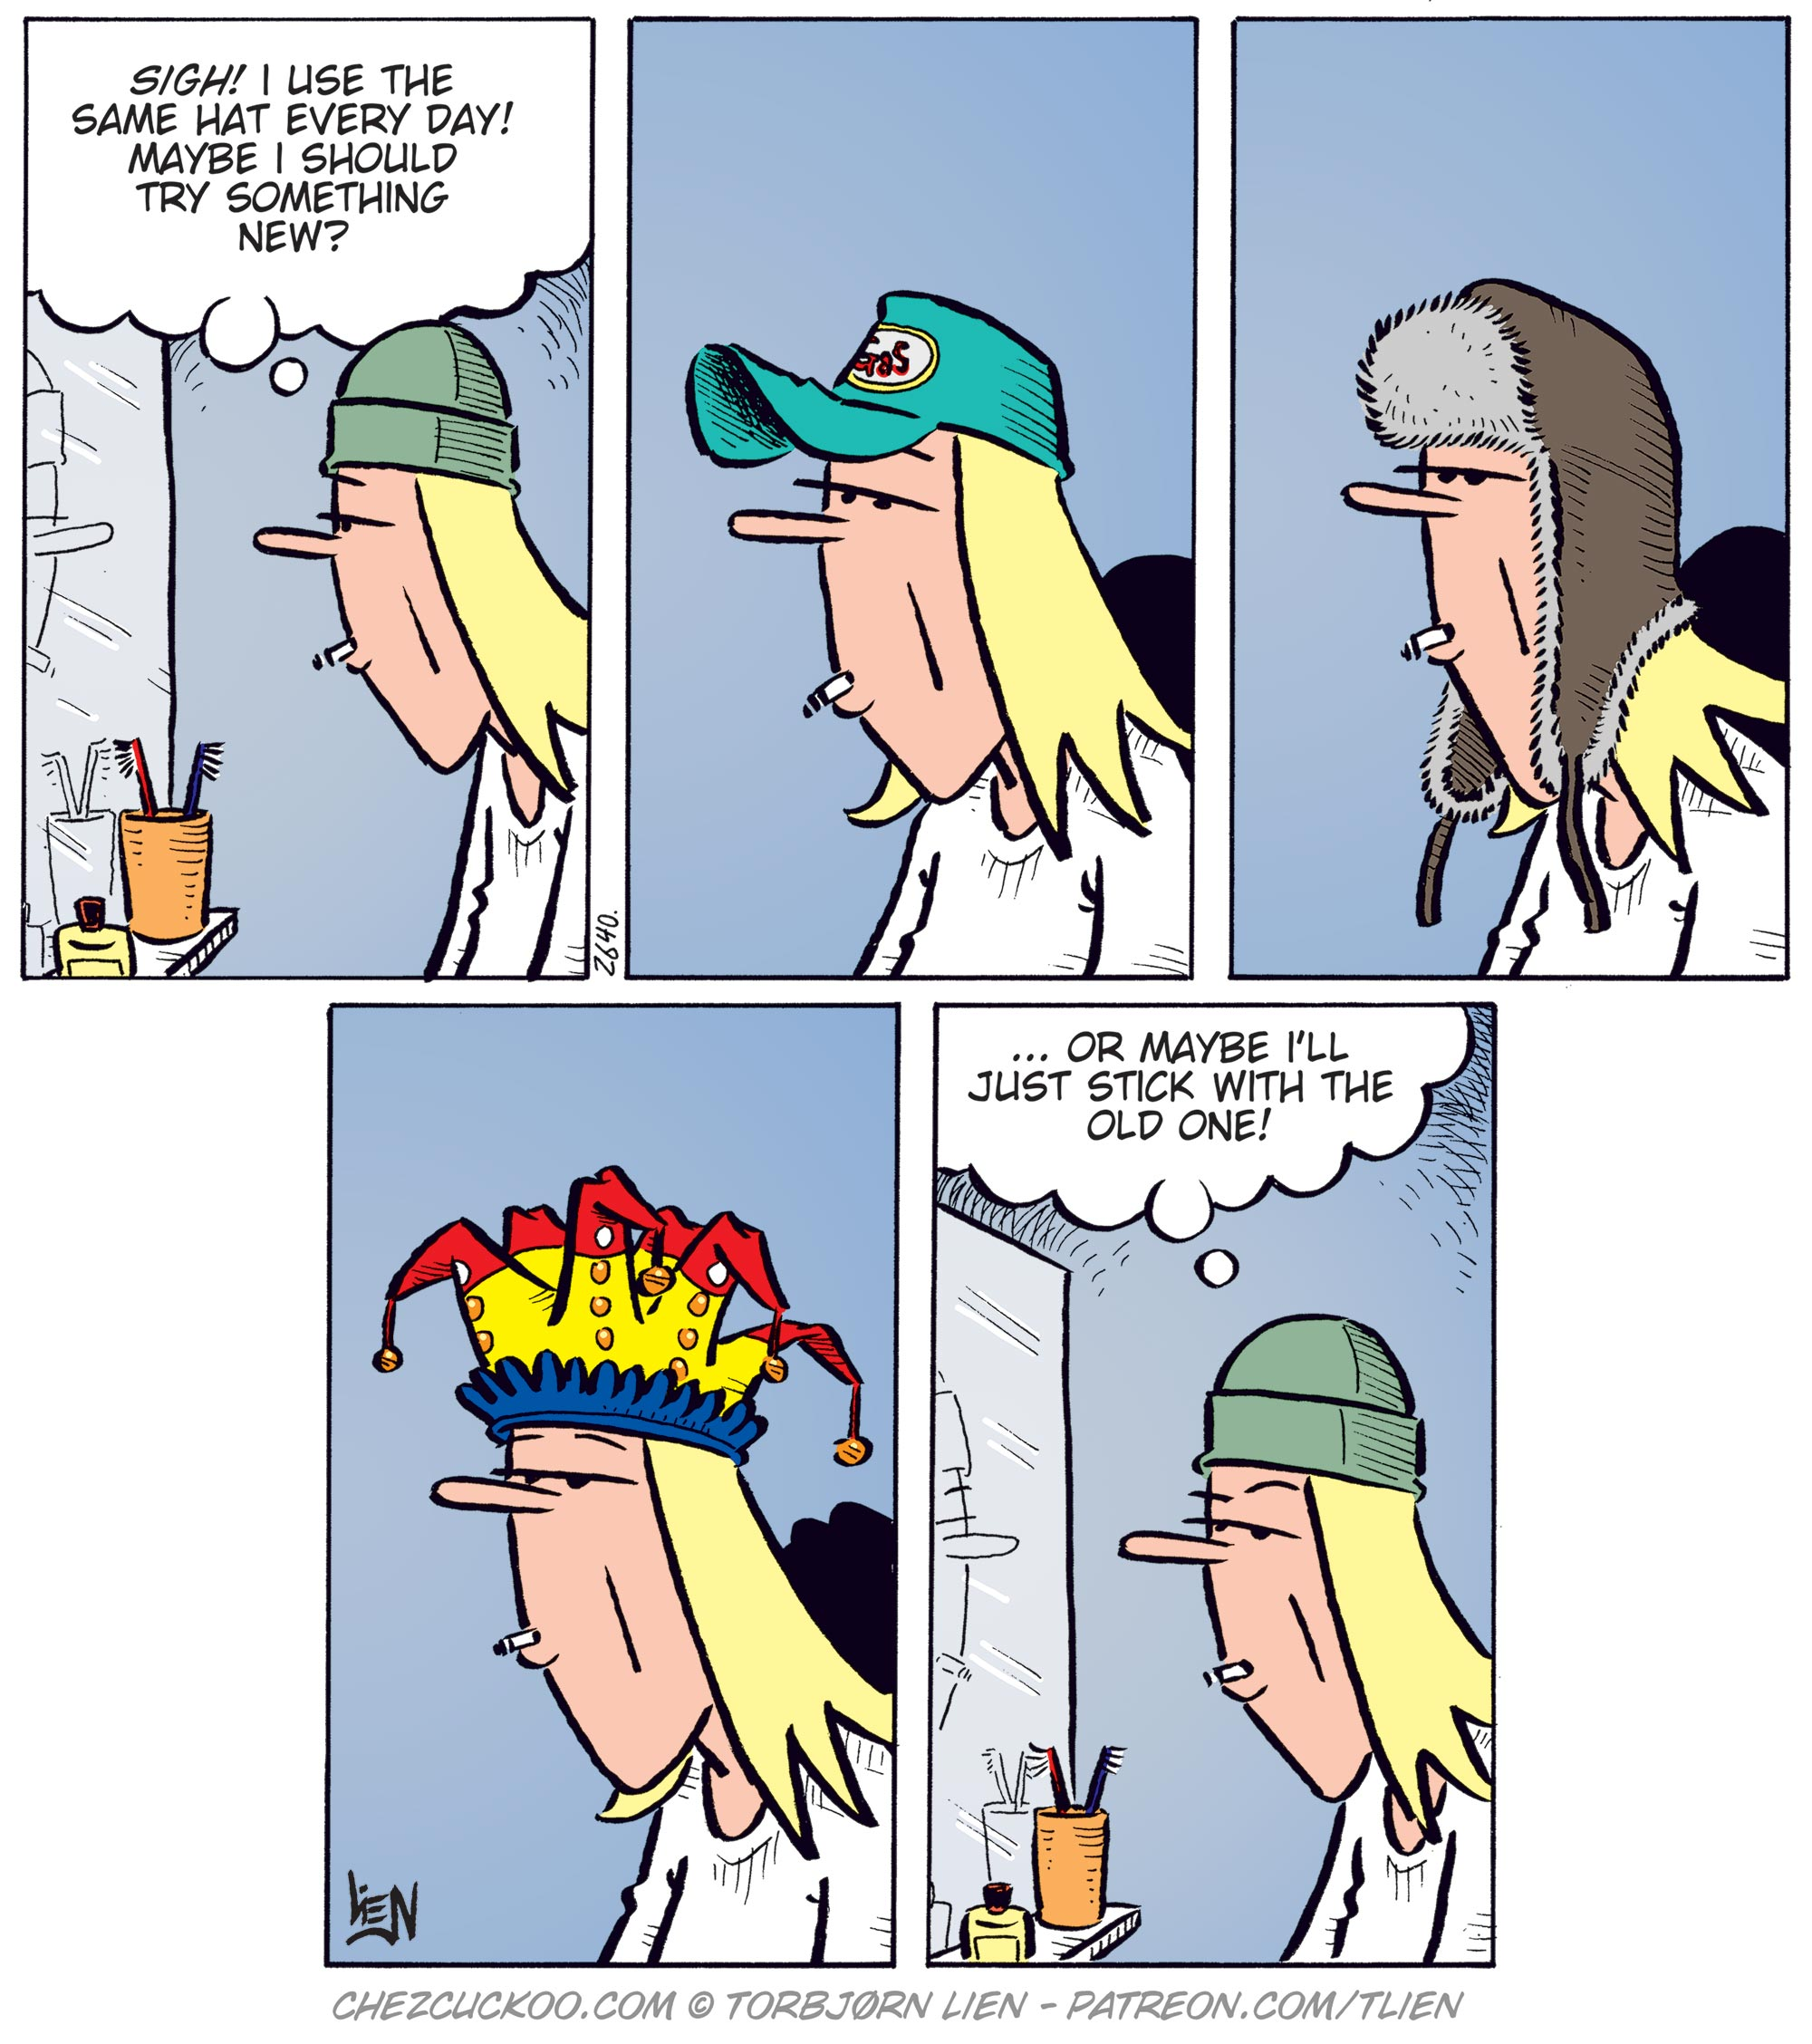 New hat?